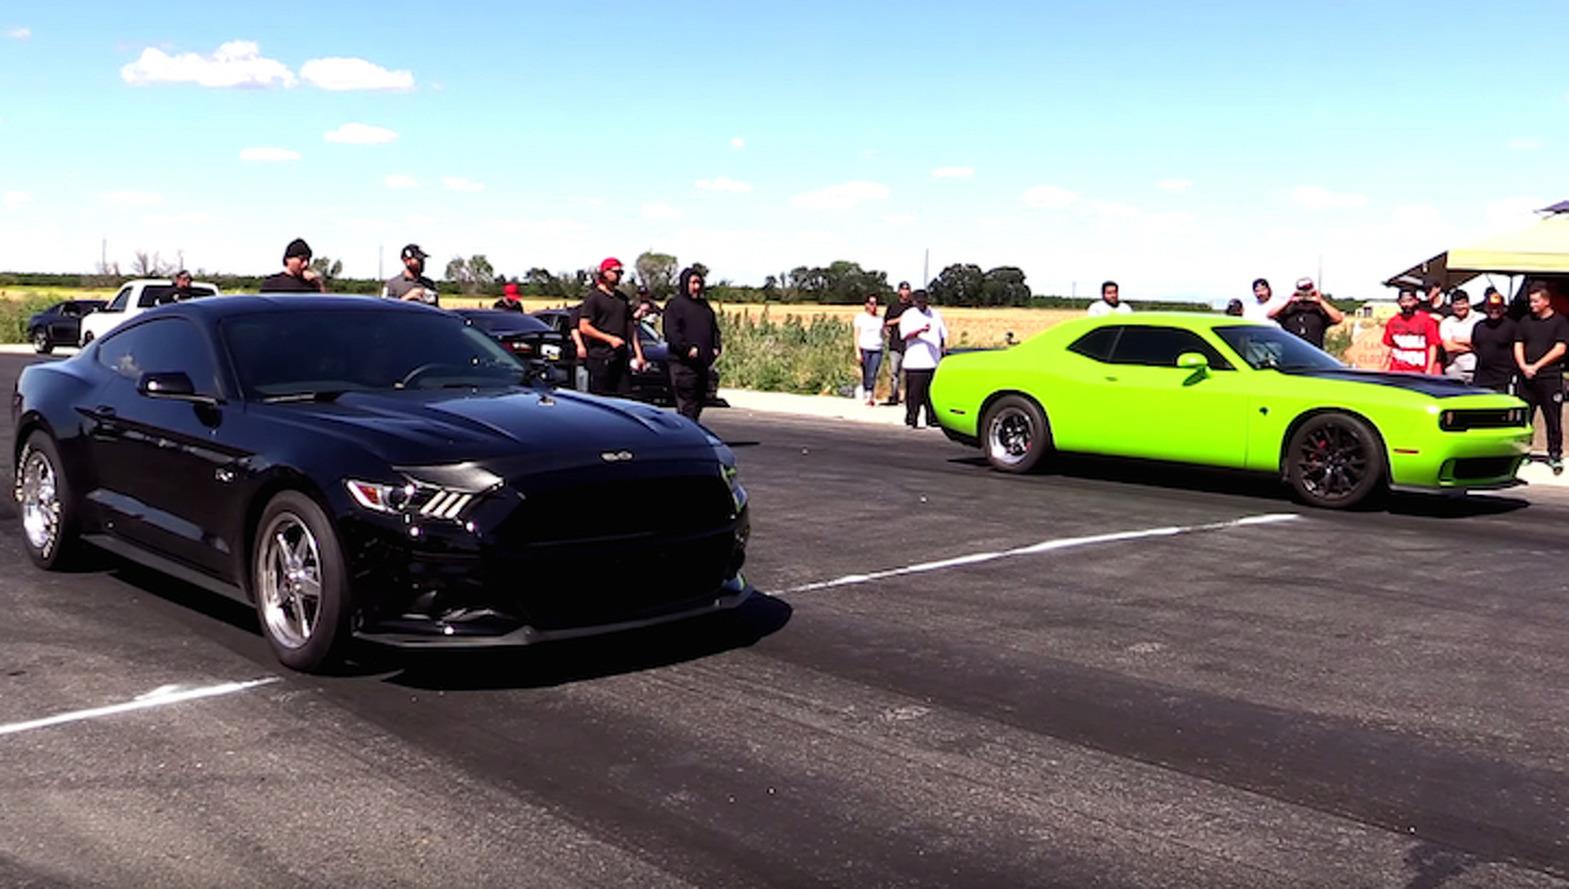 Backyard Bolt-On Brawl: Ford Mustang vs Challenger Hellcat